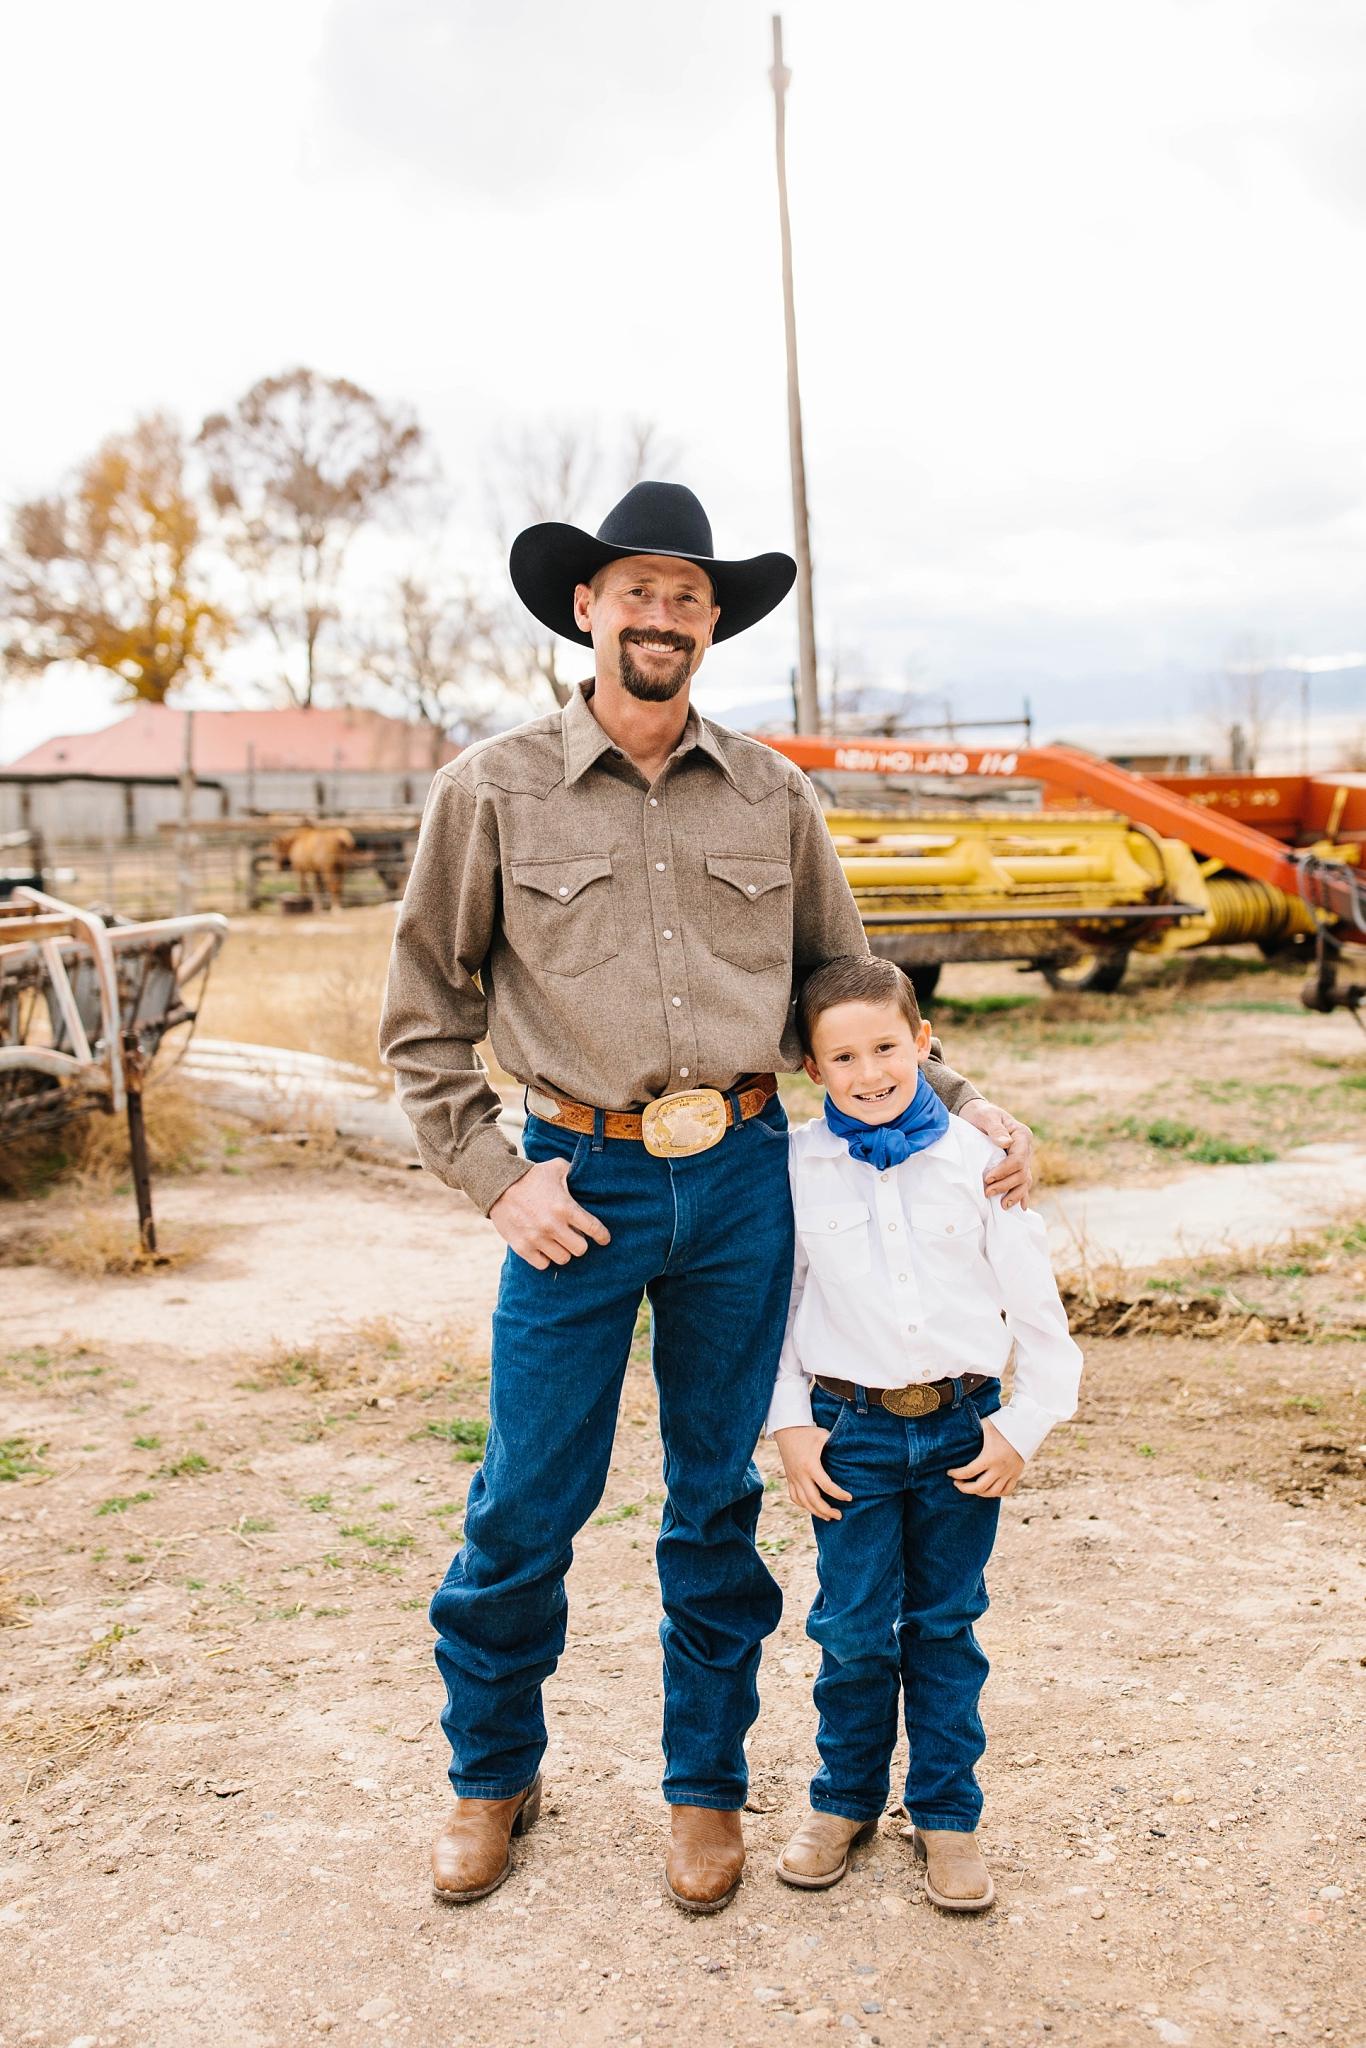 Lister-41_Lizzie-B-Imagery-Utah-Family-Photographer-Lifestyle-Photography-Salt-Lake-City-Park-City-Utah-County-Farm-Family-Session.jpg